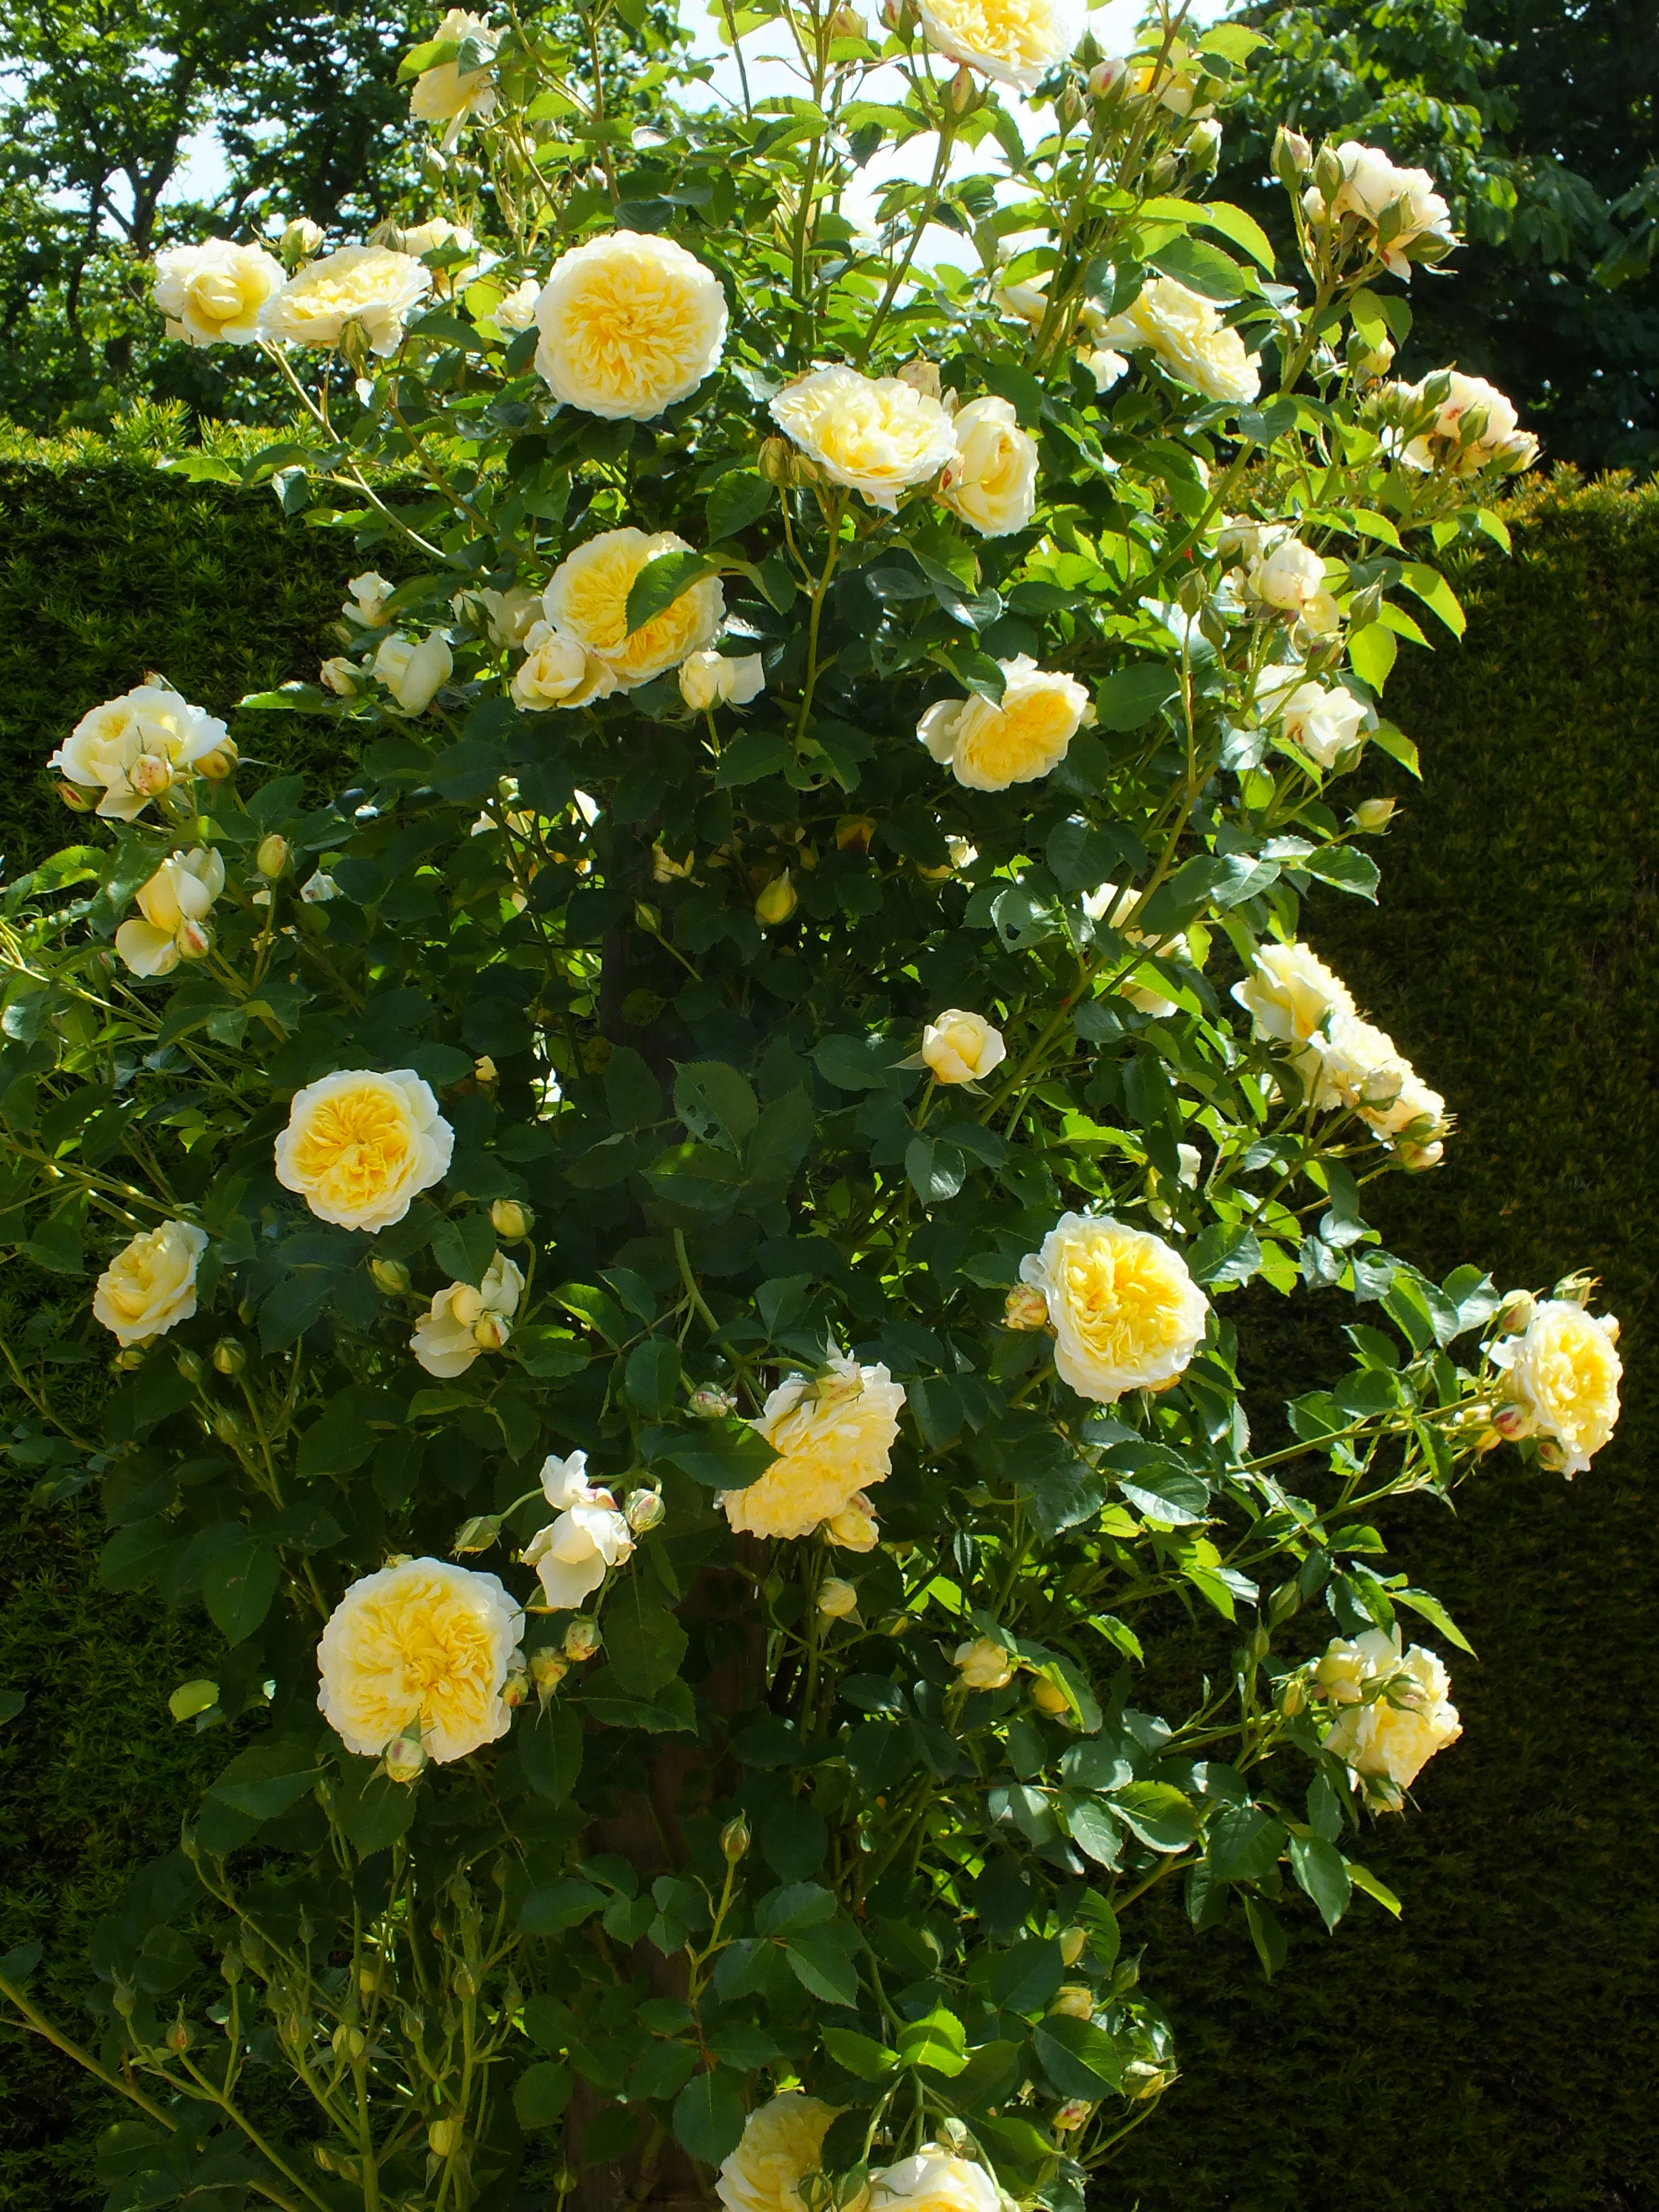 mottisfont abbey rose gardens the teddington gardener. Black Bedroom Furniture Sets. Home Design Ideas